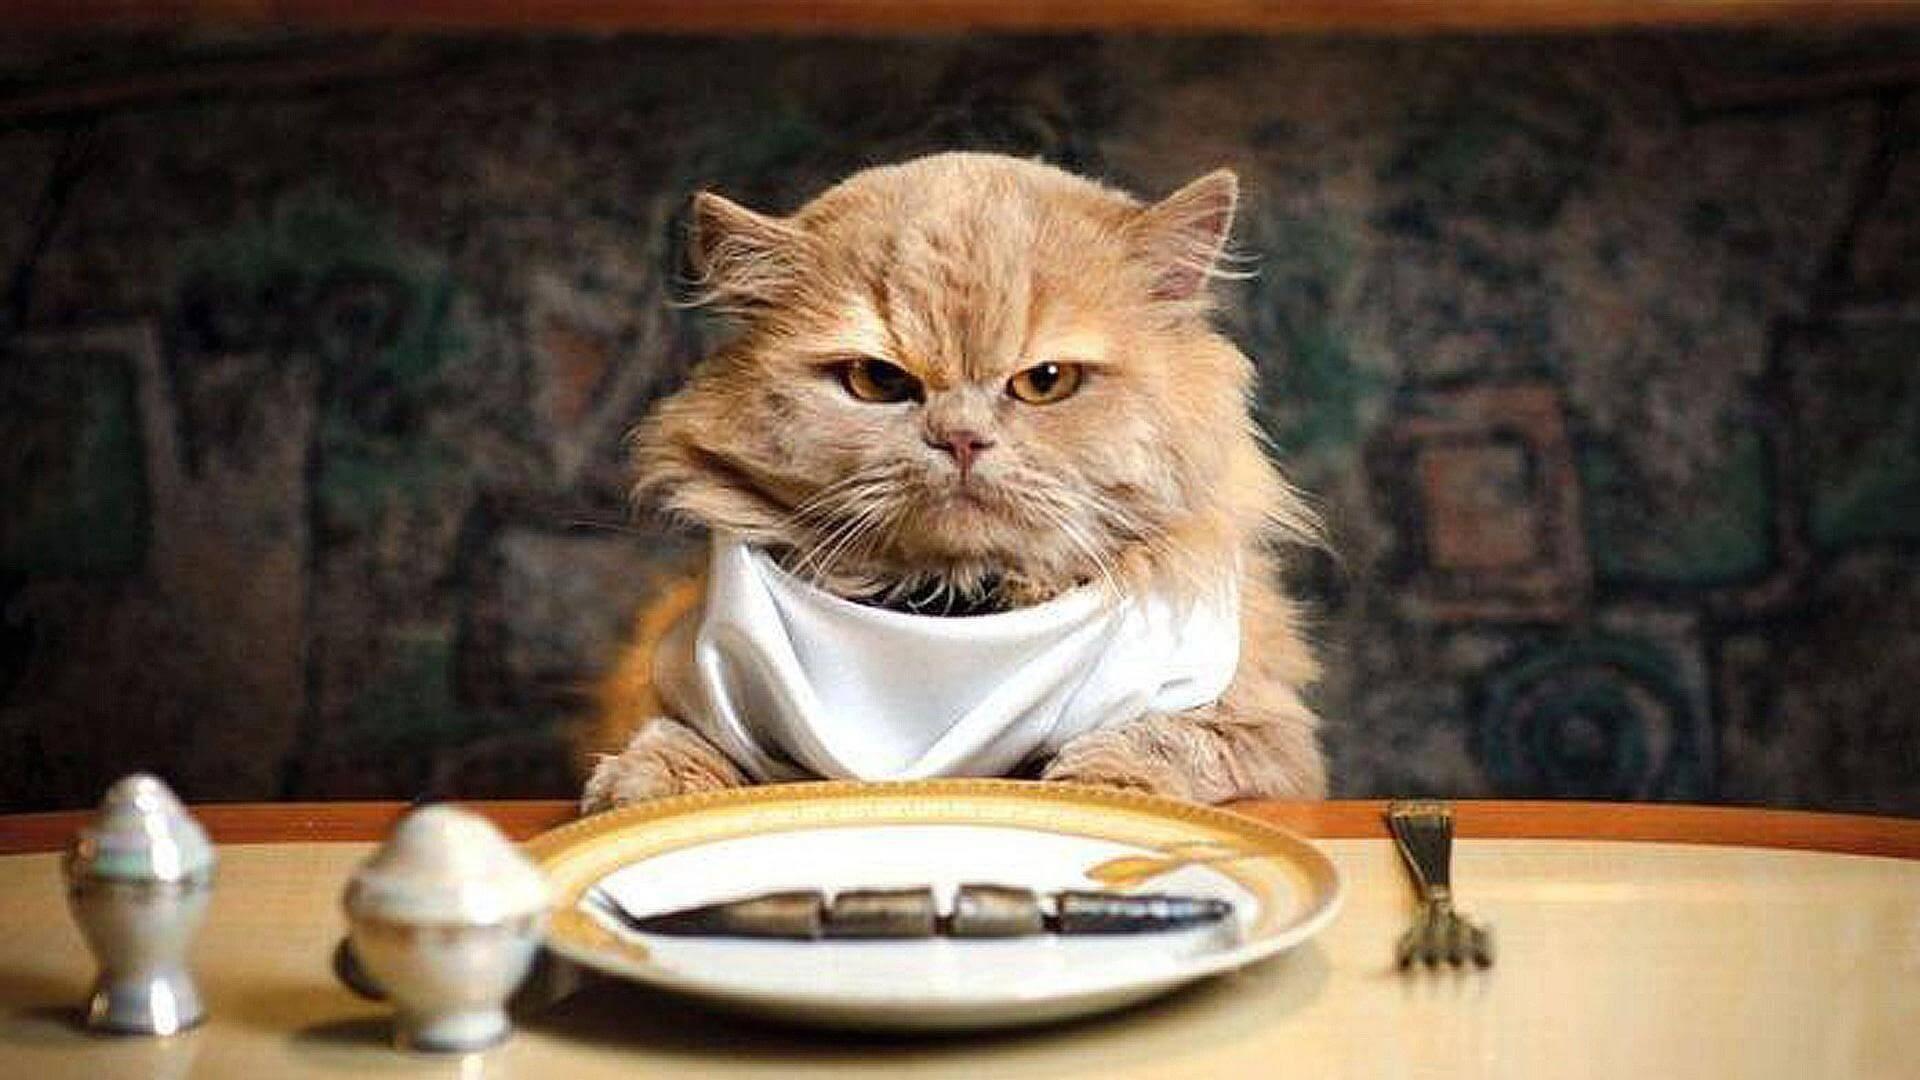 wallpaper-cat-eat-fish